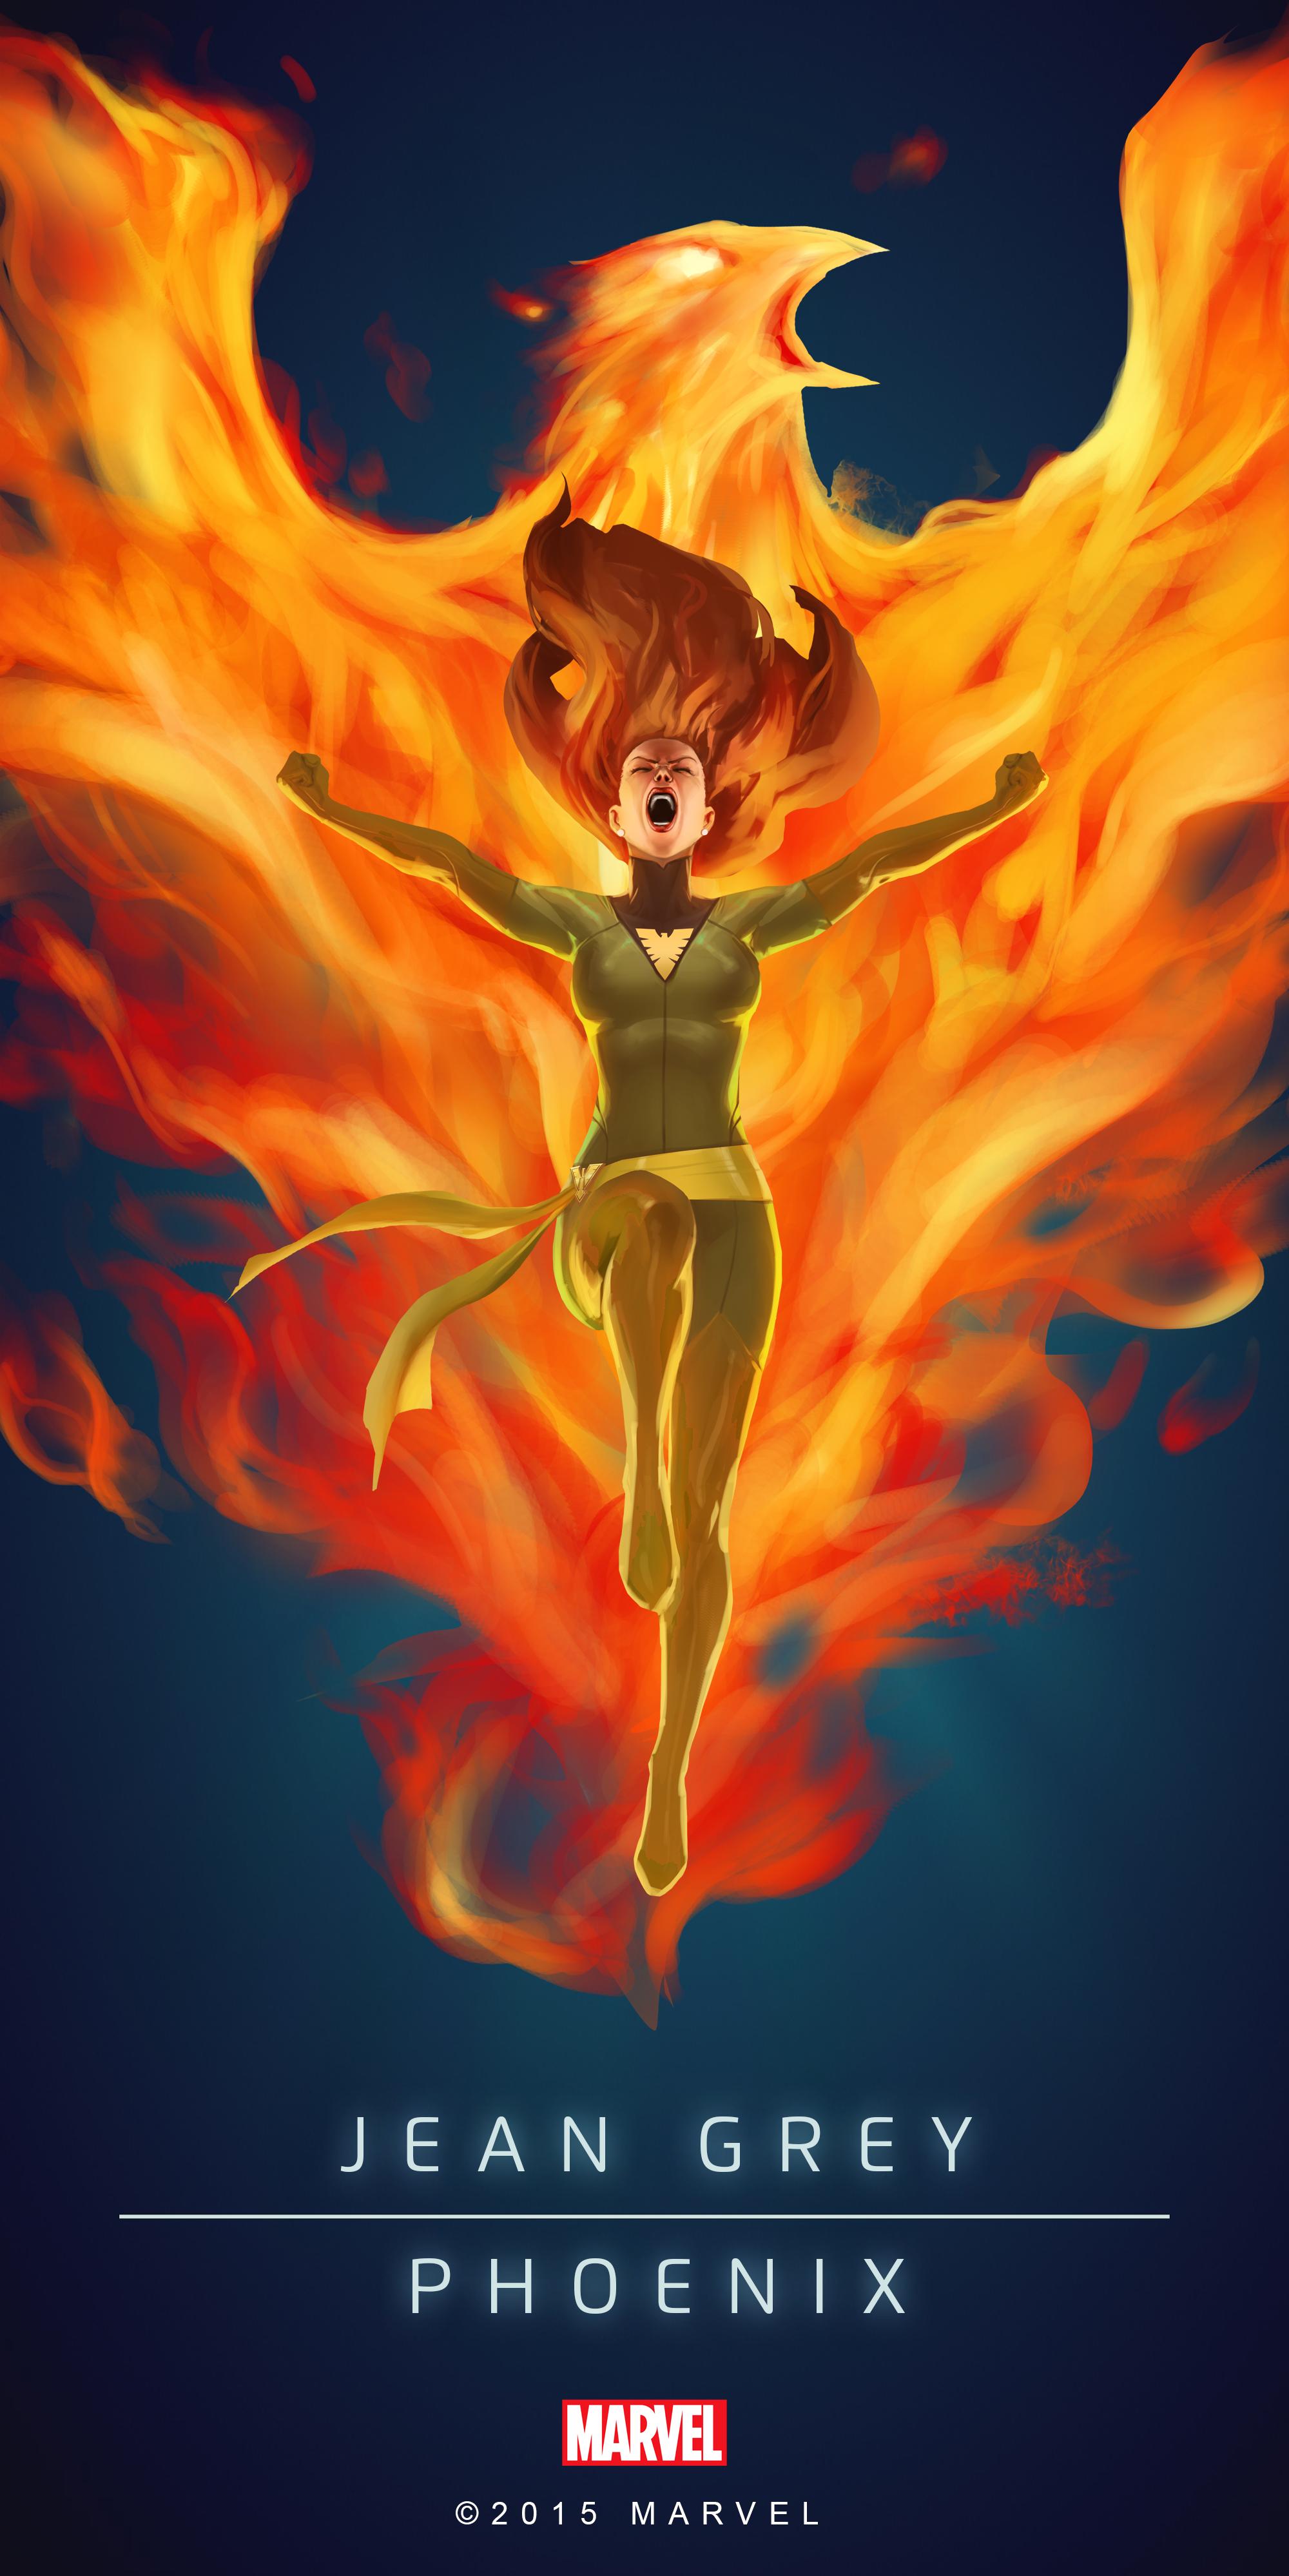 Jean_Grey_Phoenix_Poster_02.png (2000×3997) Marvel